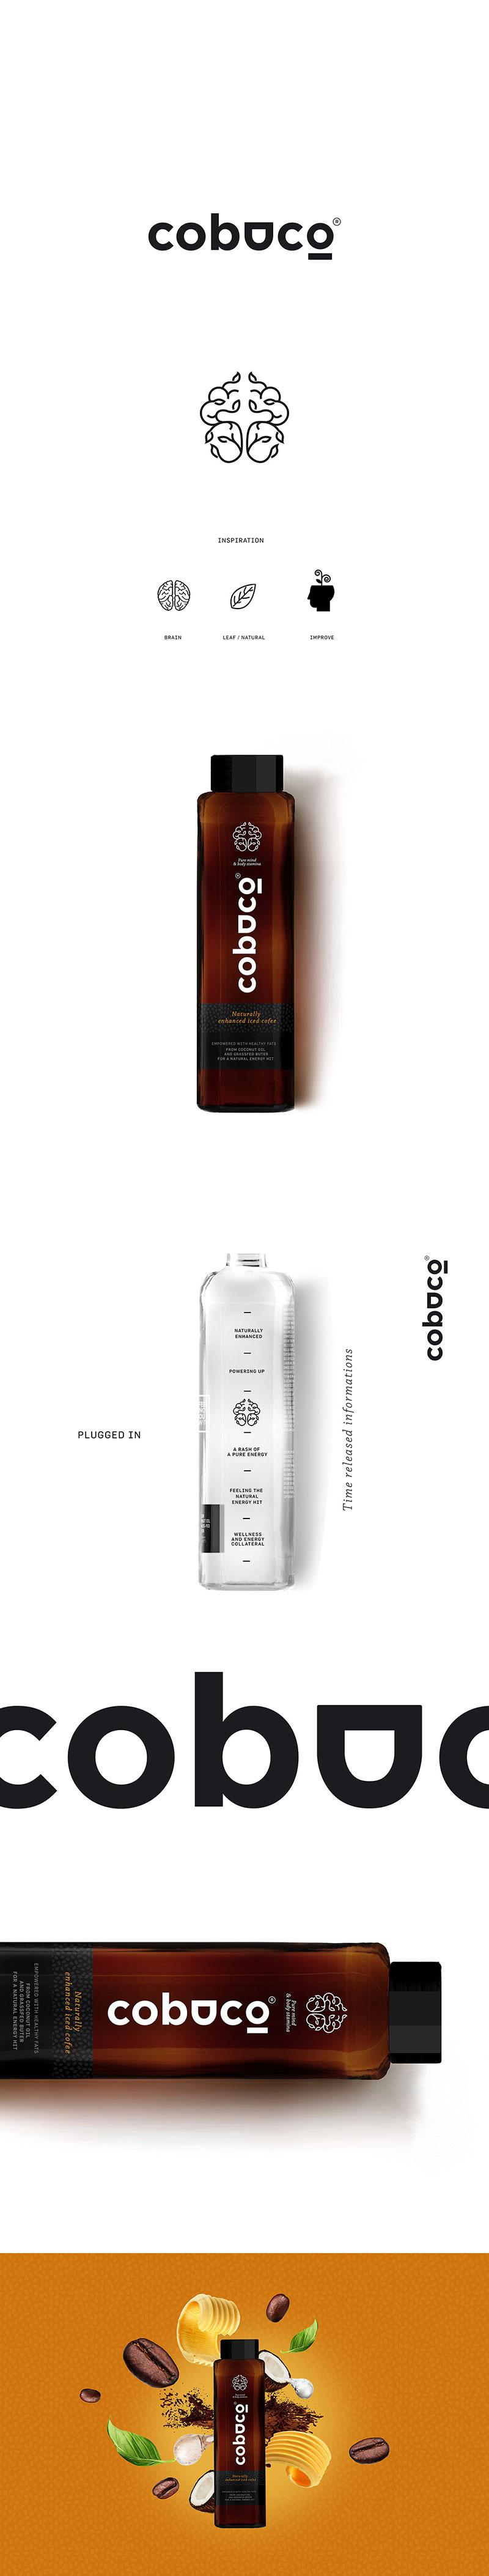 cobuco Iced Coffee by Brain&Bros DZ.